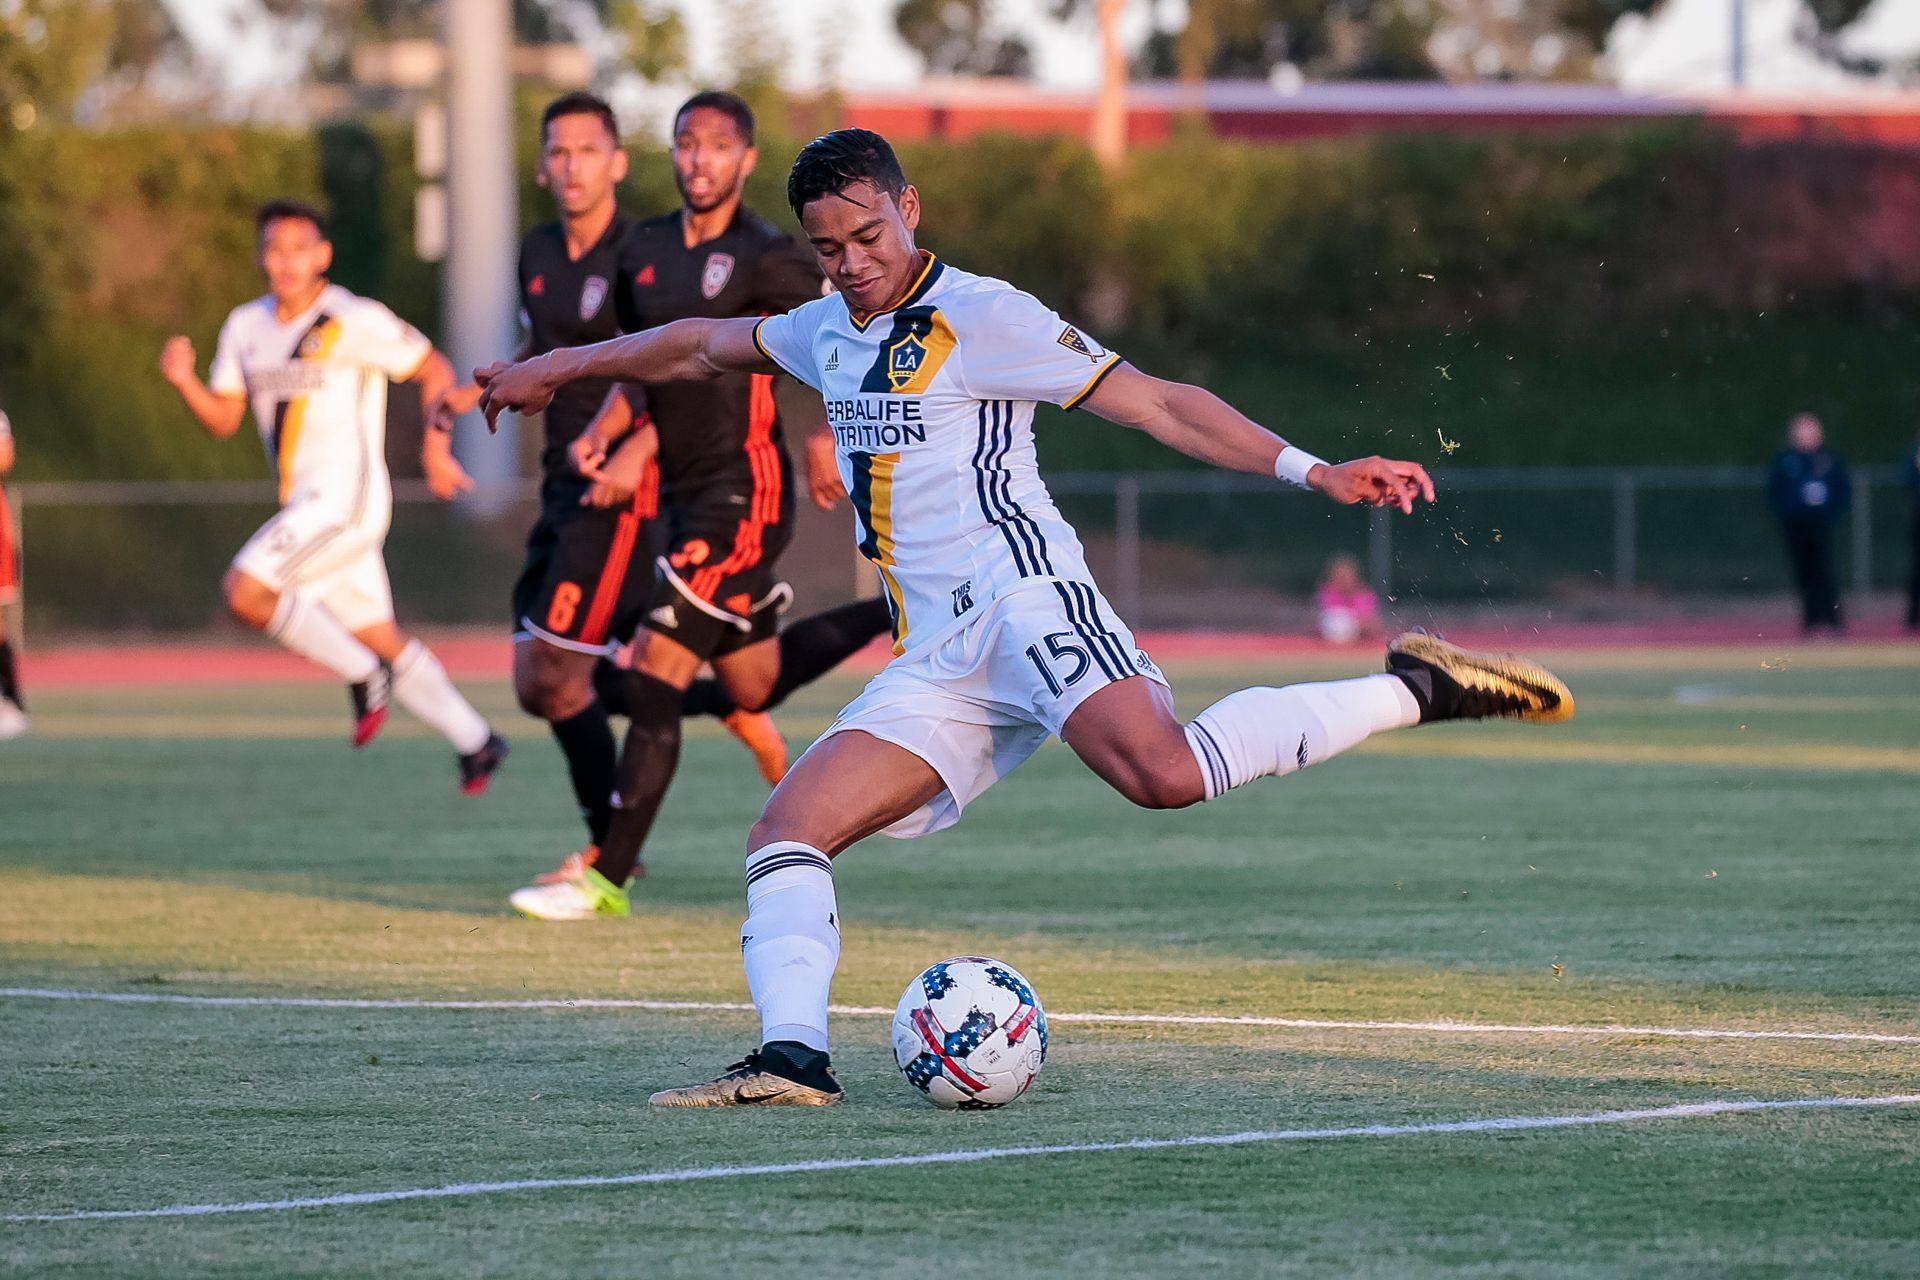 LA Galaxy Are Final Southern California Team In 2017 U.S. Open Cup